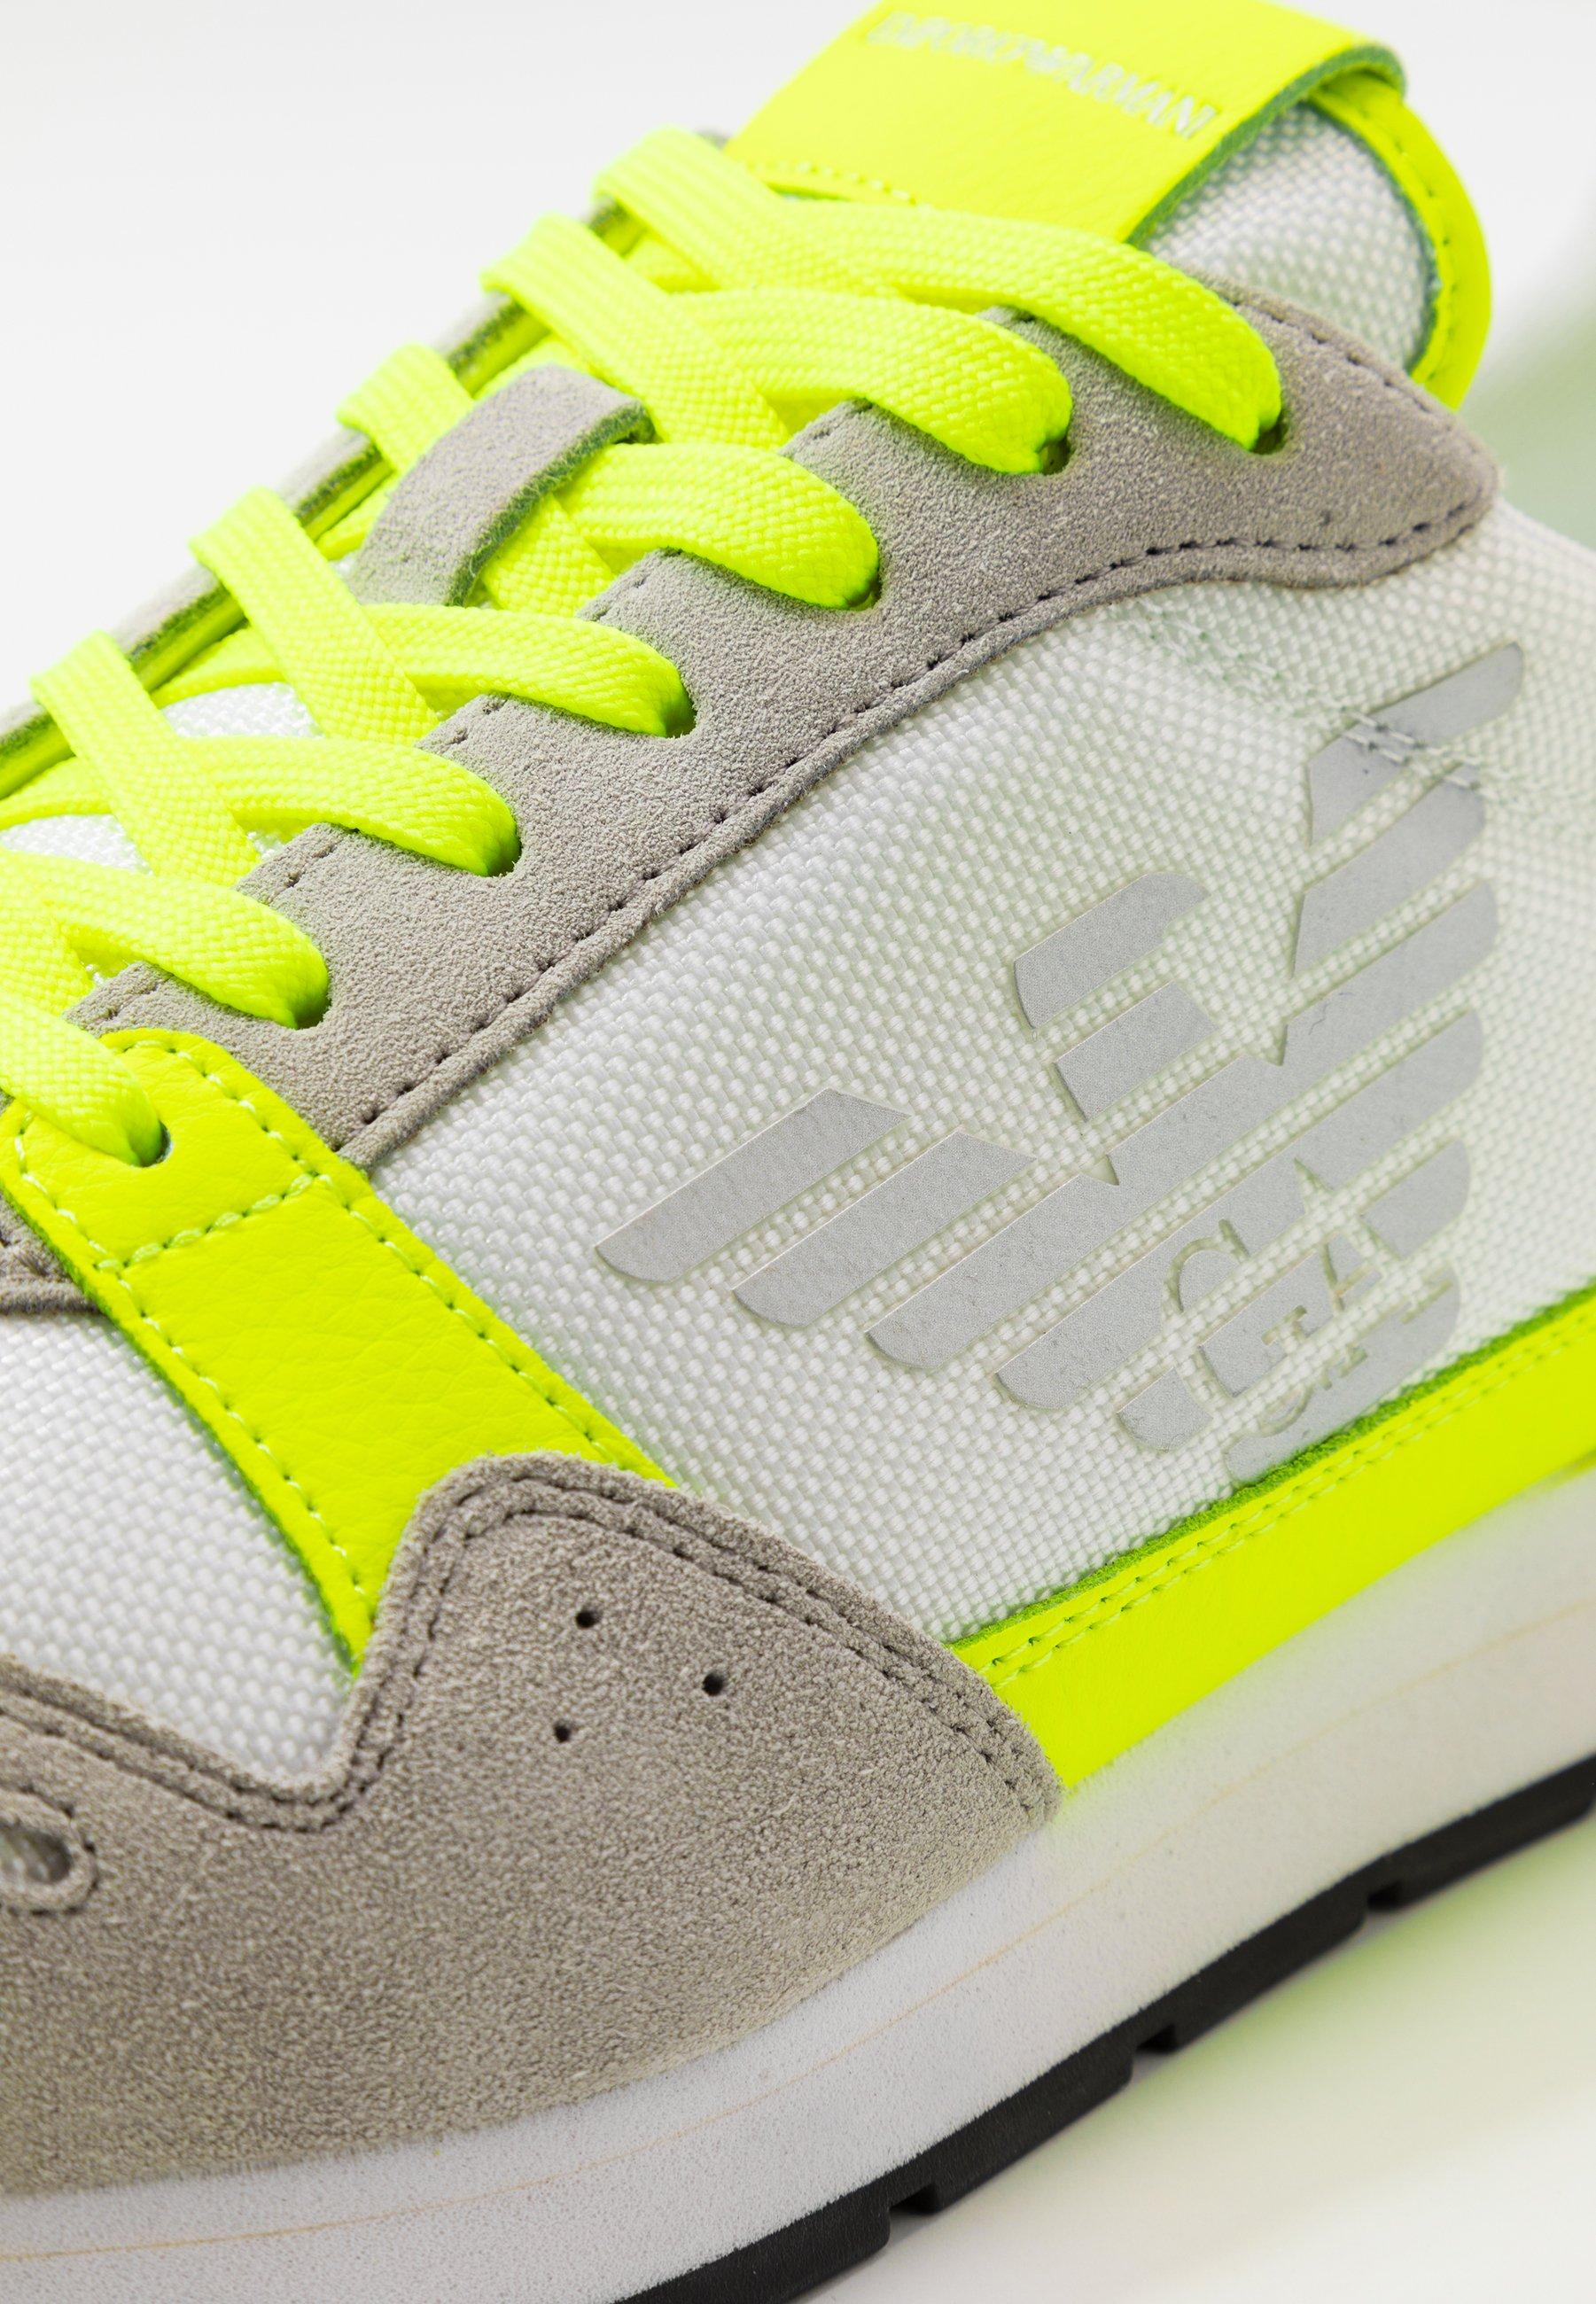 Emporio Armani Zone - Sneakers Yellow/grey